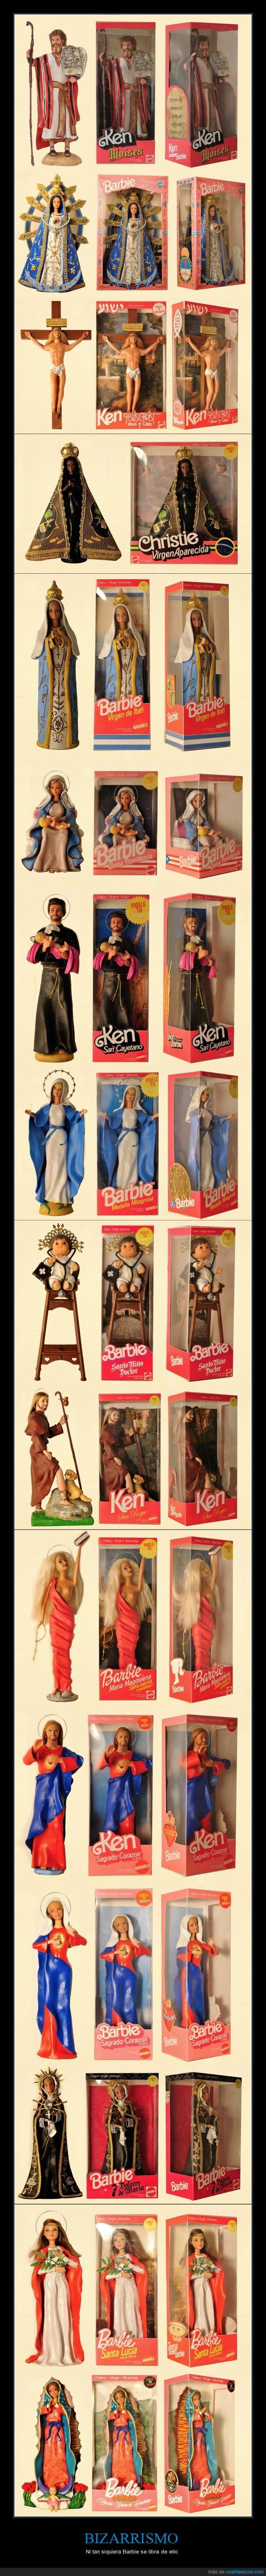 barbie,buda,juguetes,pool&marianela